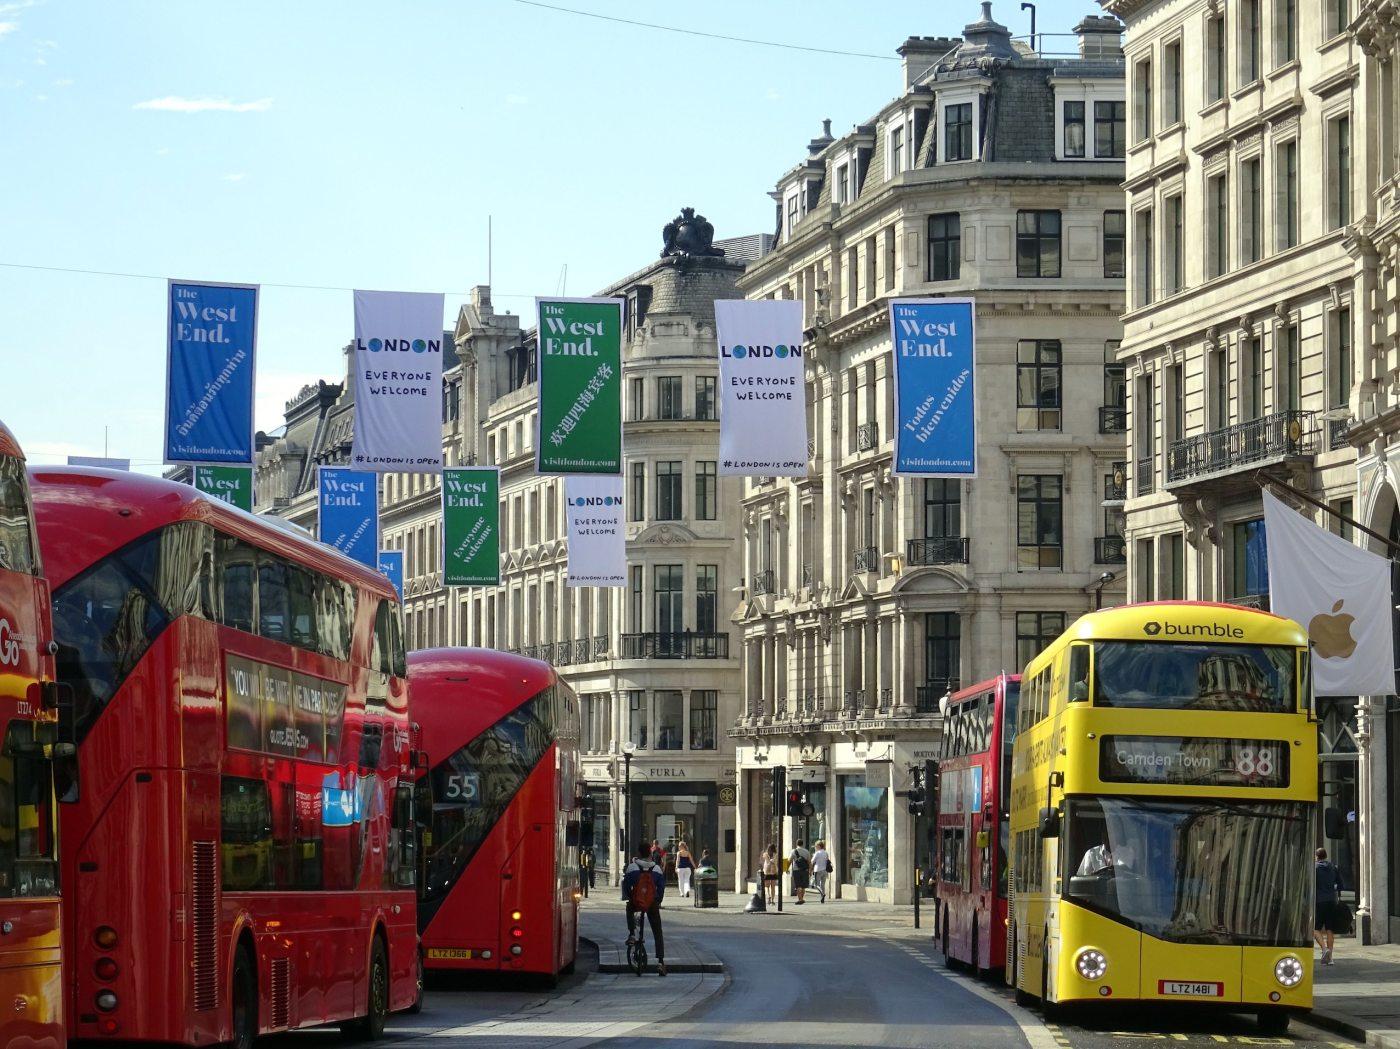 The best street in London for bag shoppiing